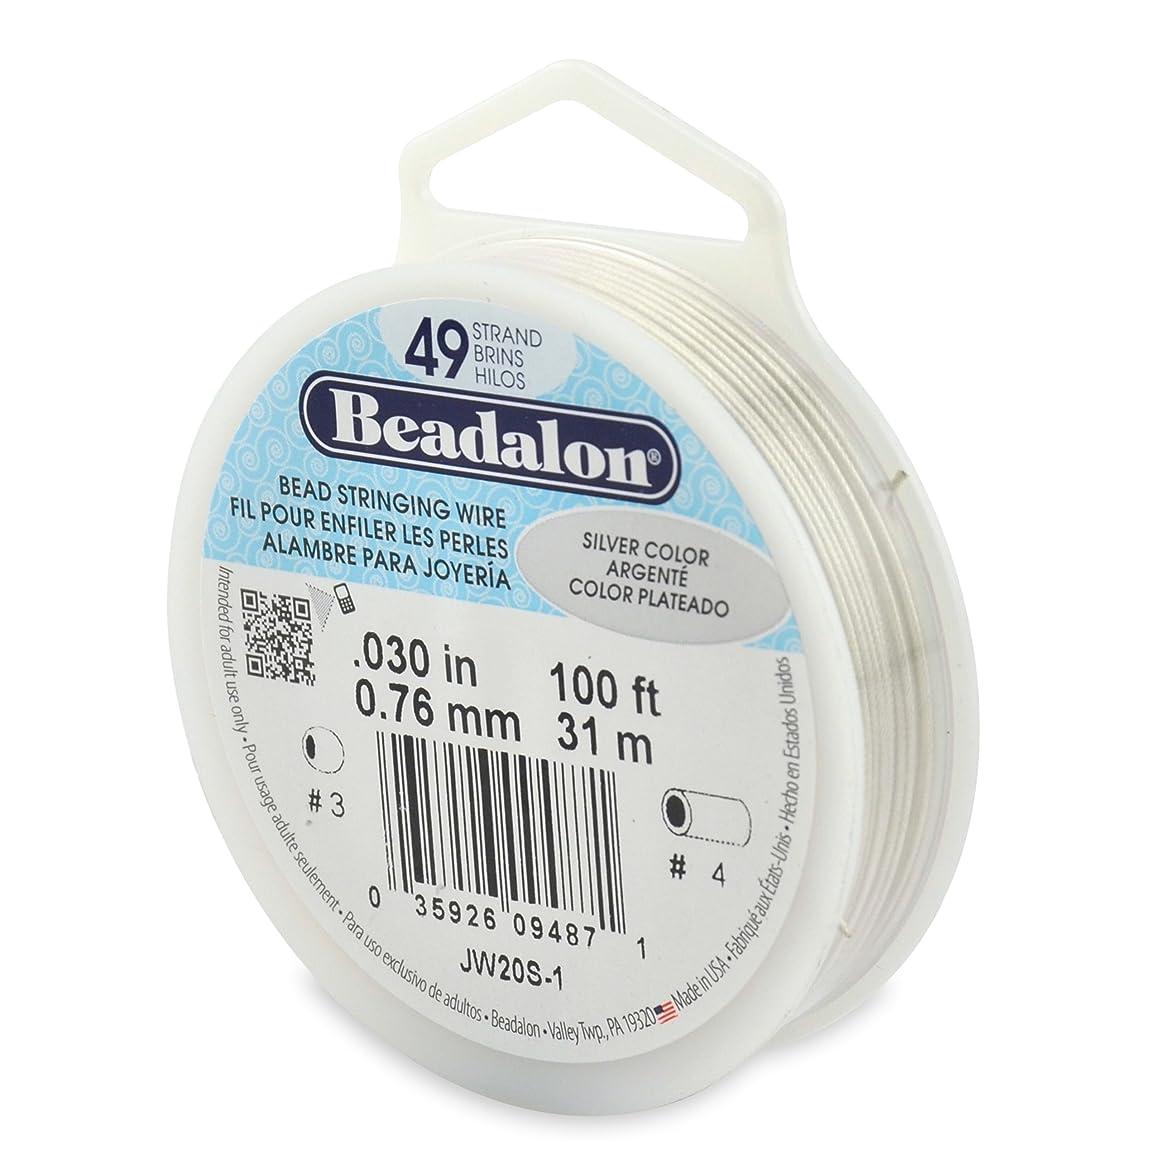 Beadalon 49-Strand Bead Stringing Wire, 0.030-Inch, Silver Color, 100-Feet